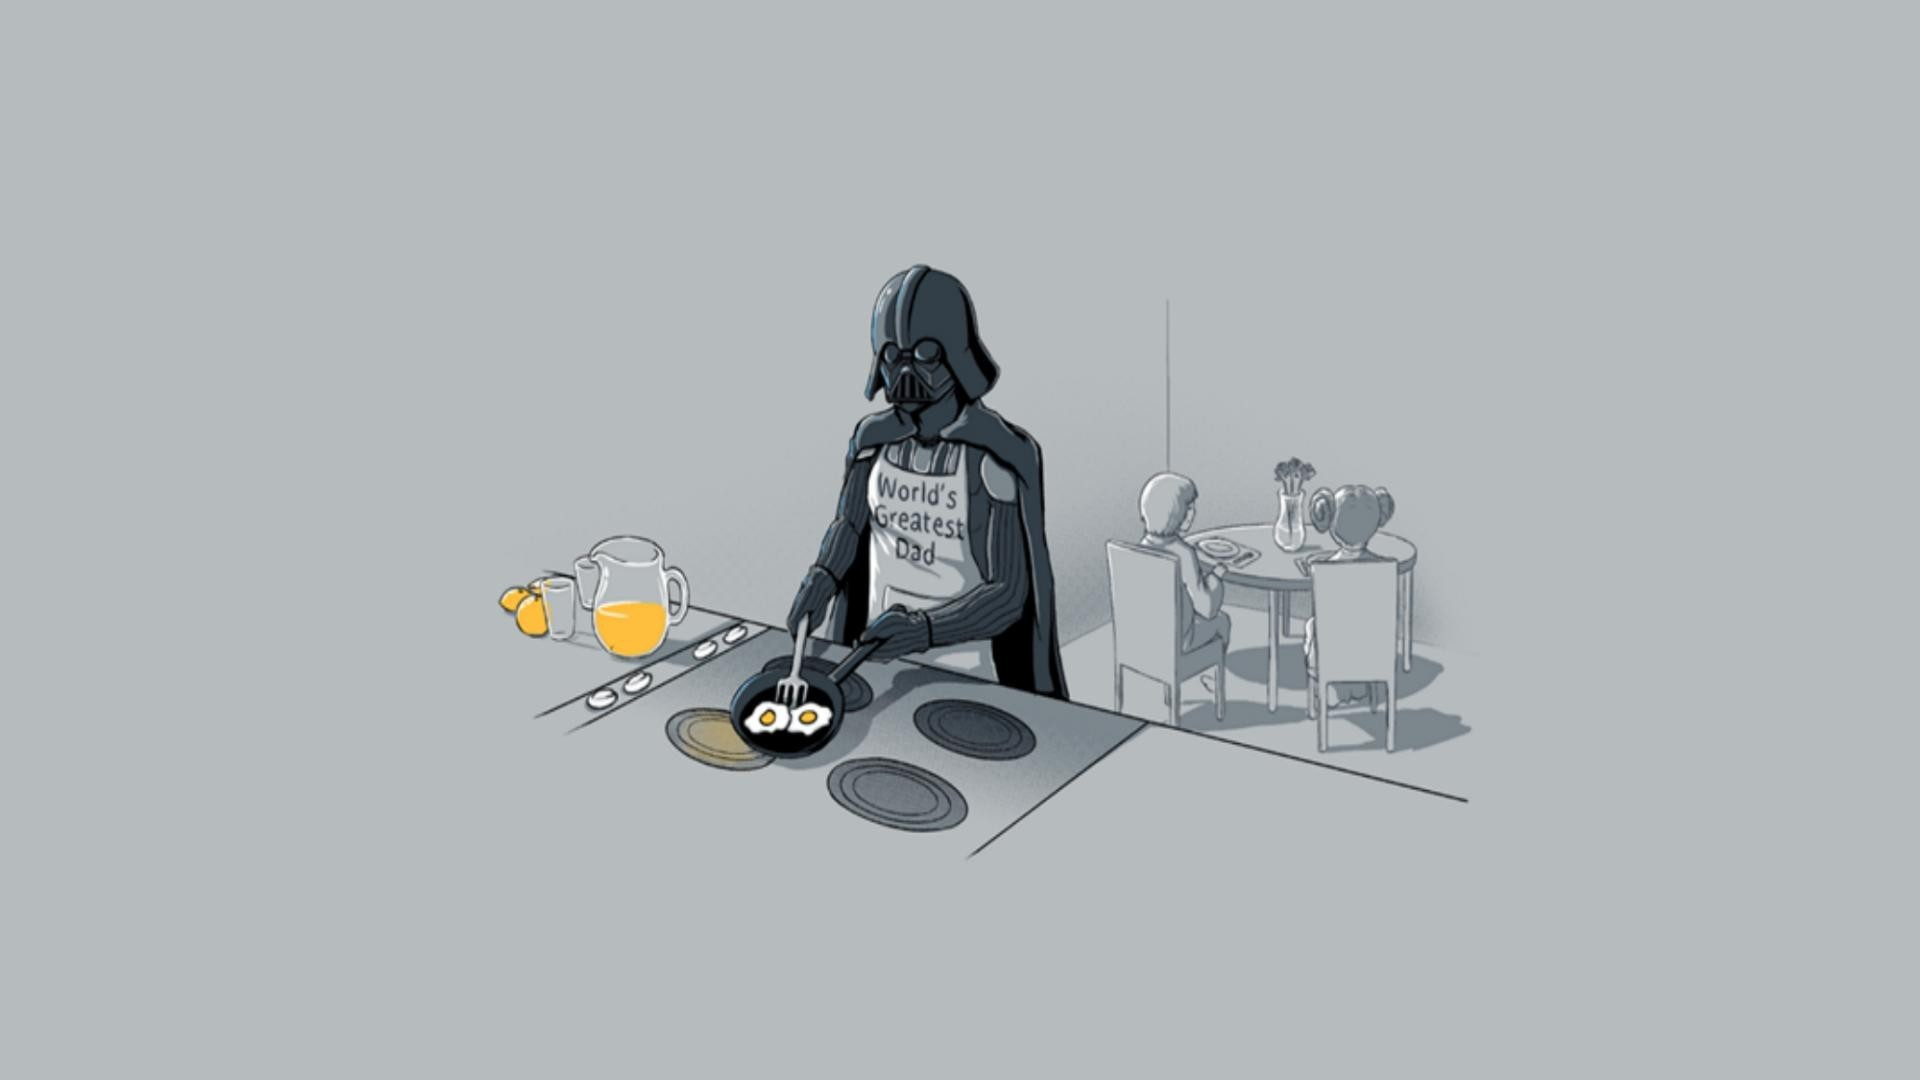 Funny Star Wars Wallpapers Wallpapertag